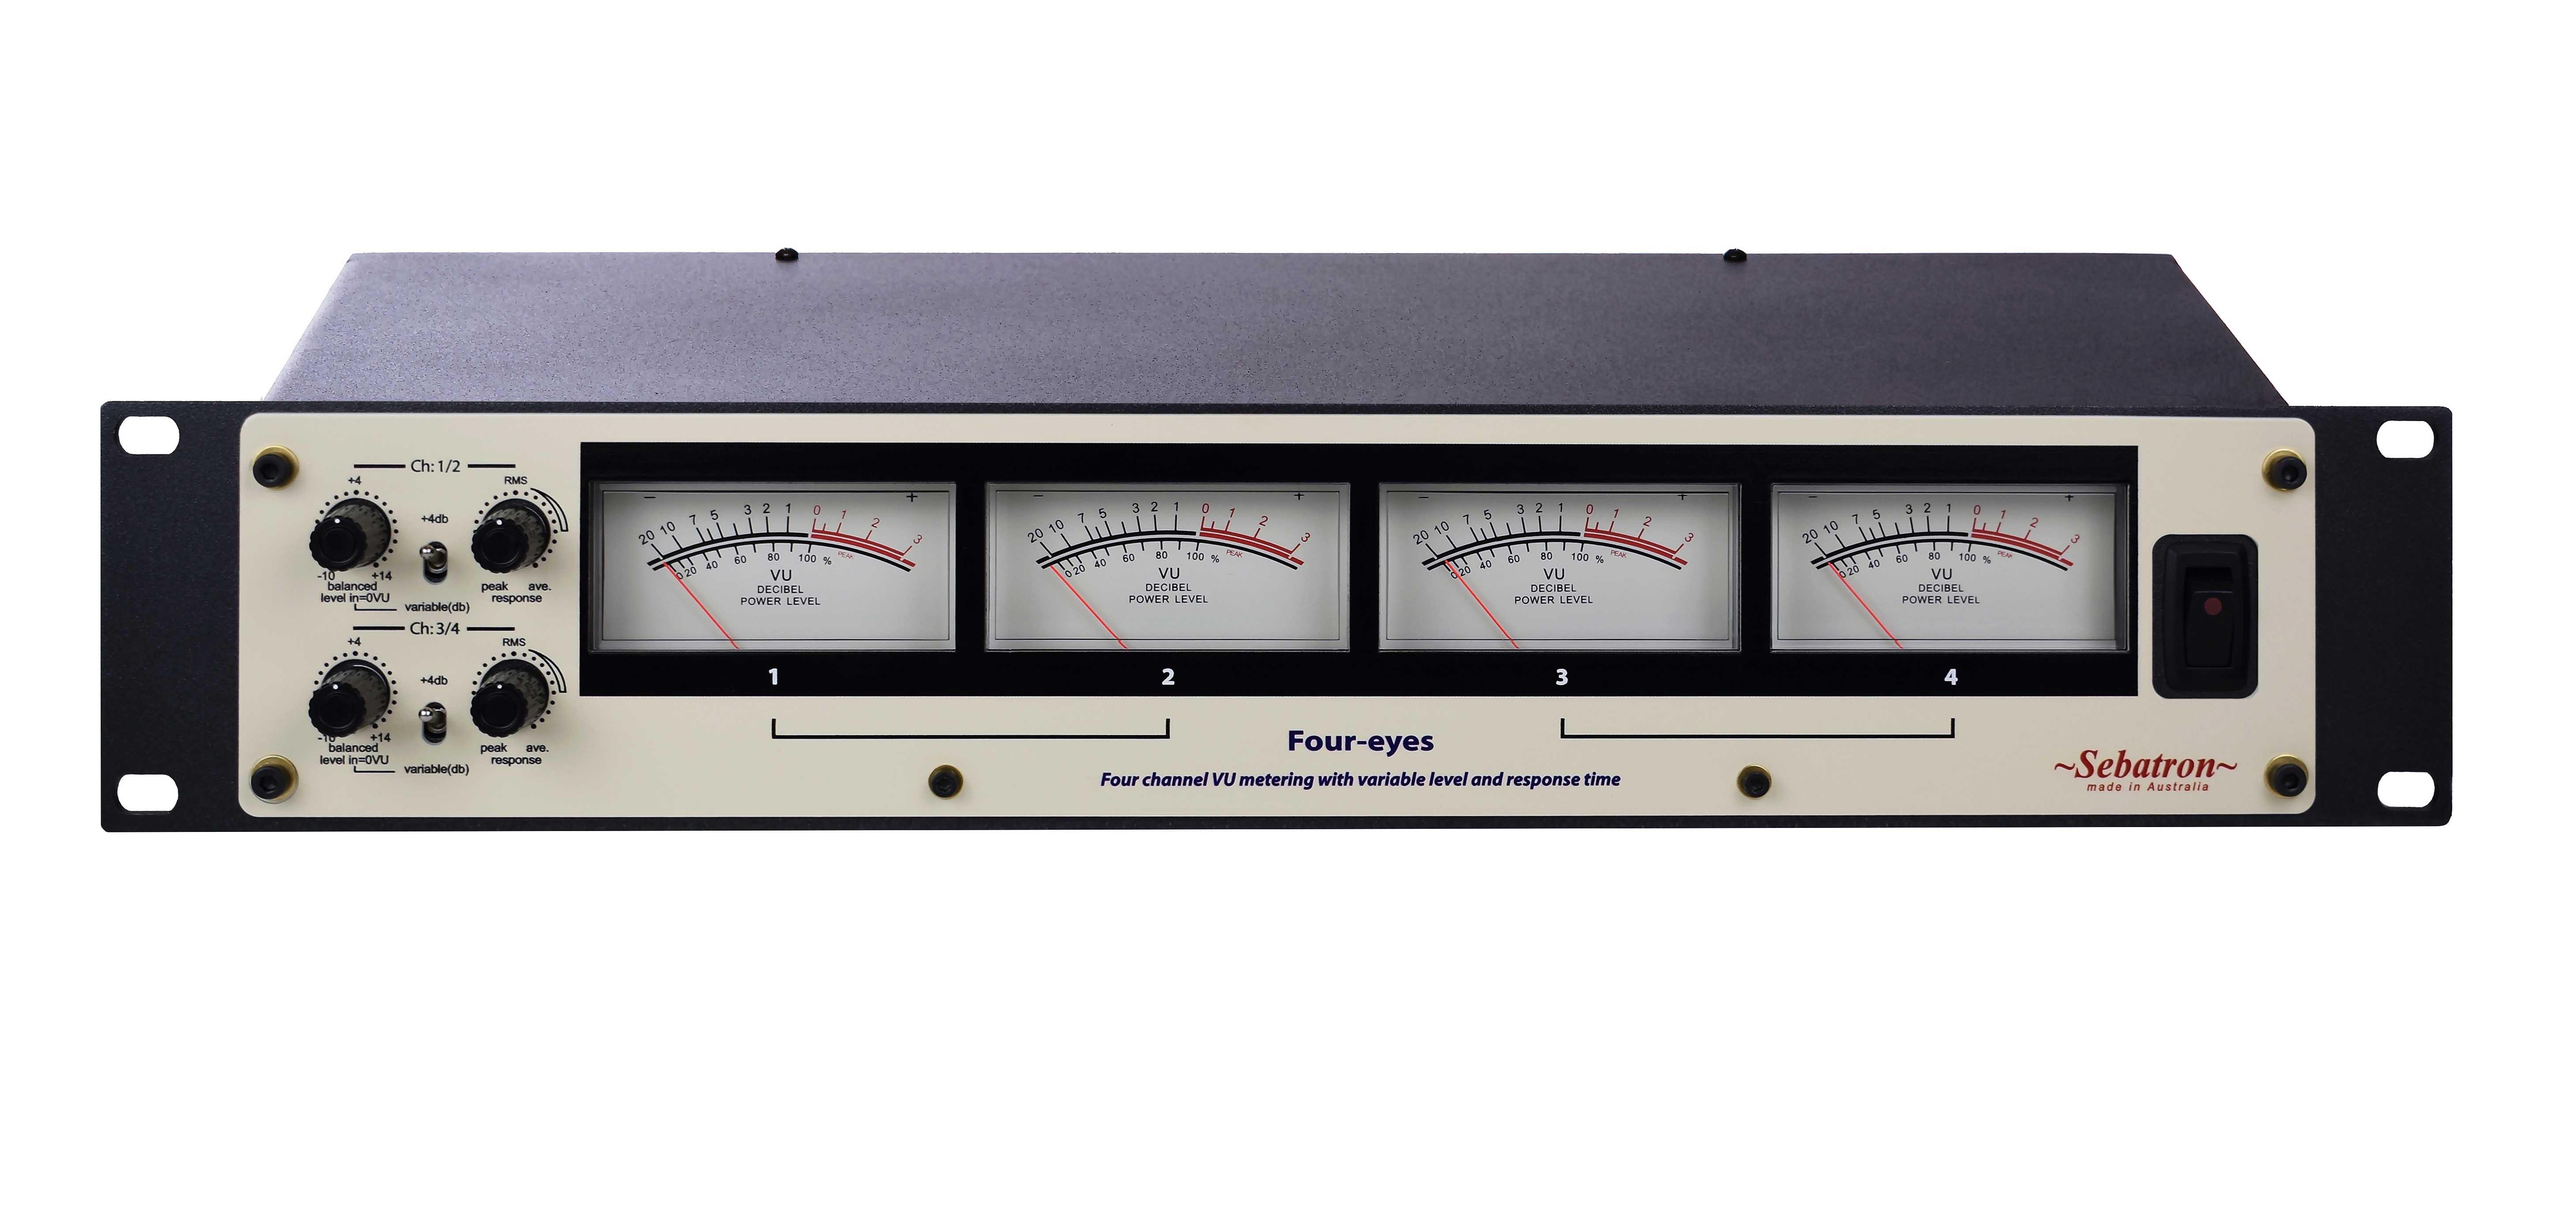 Sebatron Made In Australia How To Build Vu Meter 2 Manual Information Hi Res Photo